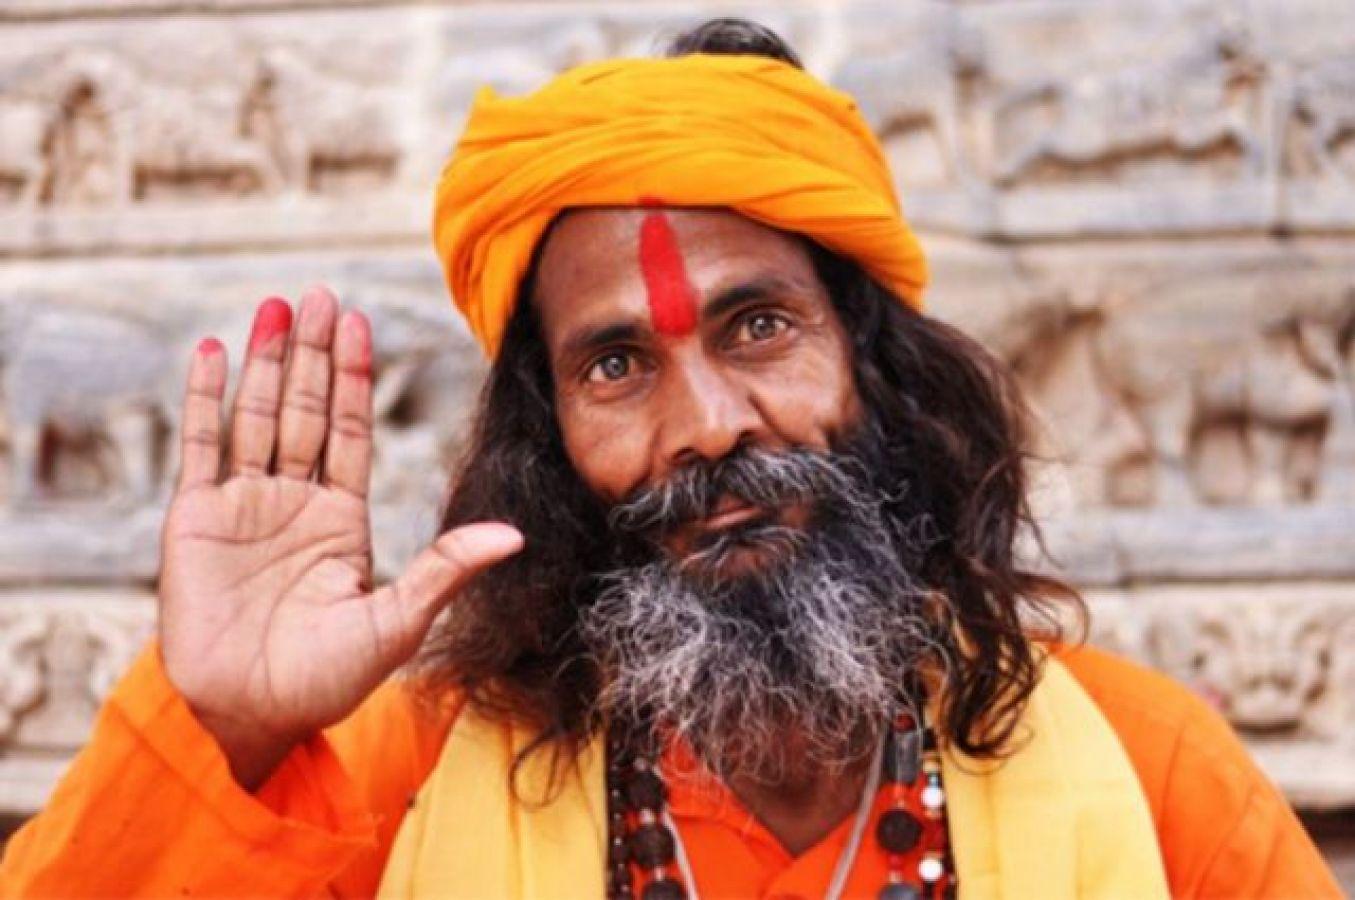 PunjabKesari, Tilak, तिलक,Benefits of applying tilak, Advantages of Tilak, Dharmik Concept, Religious Concept, Hindu Shastra, Punjab Kesari, Dharm